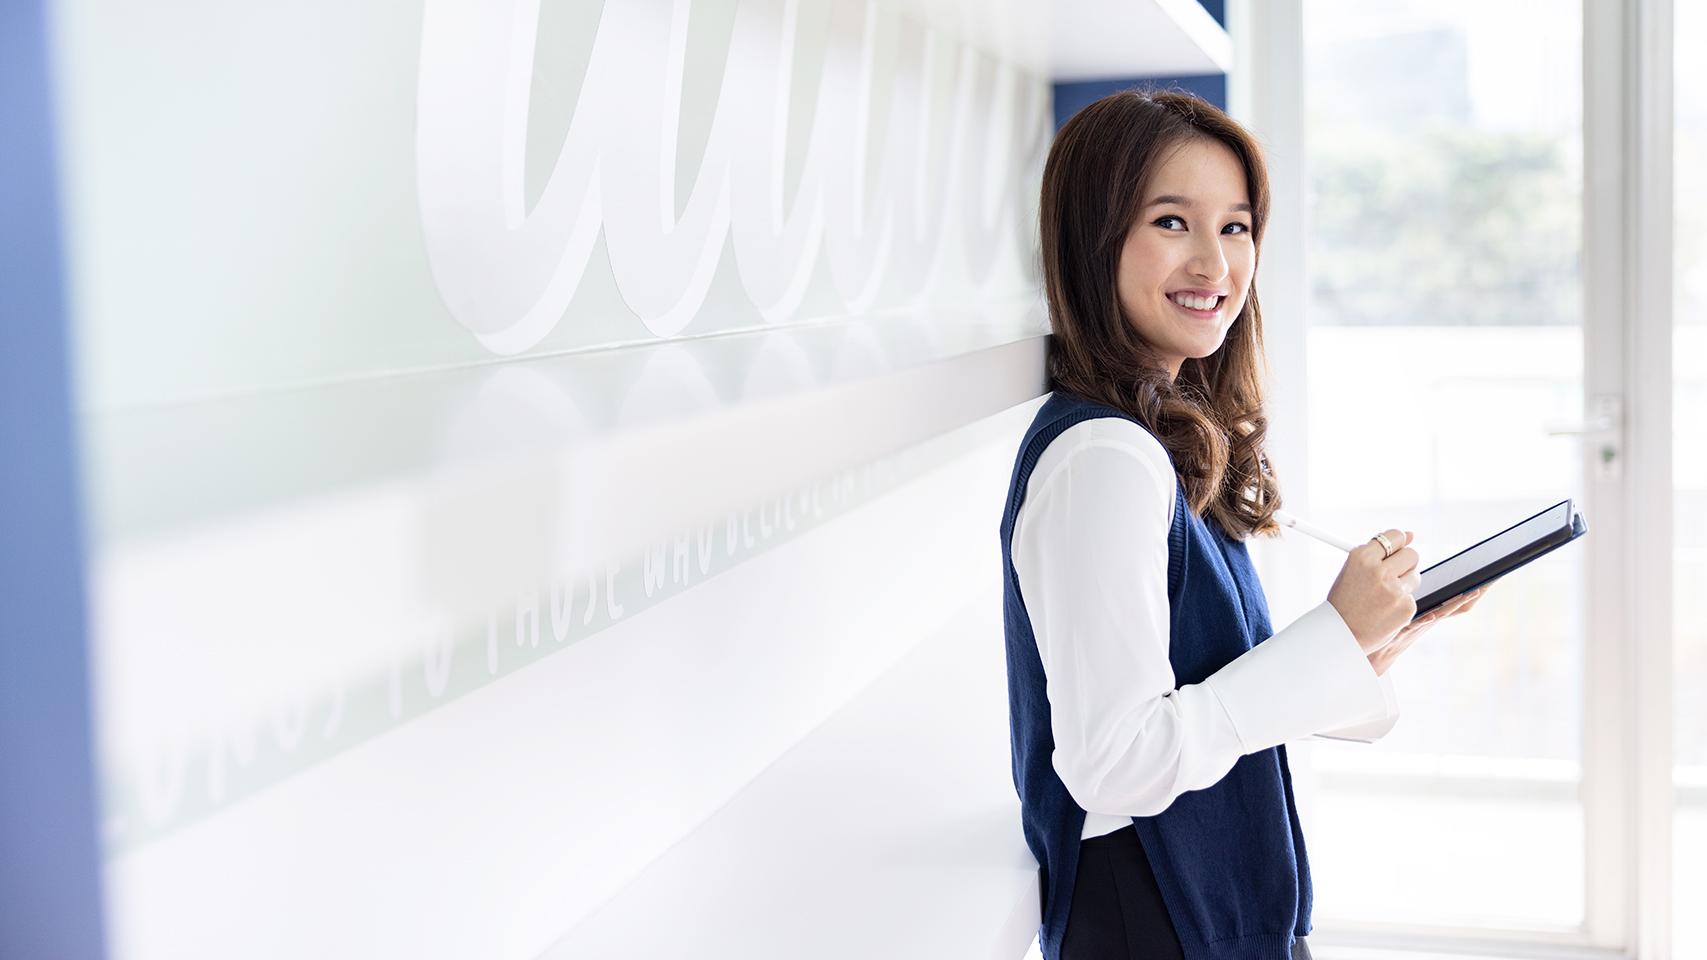 Yuka Goto_CUHK Business School IBBA Year 3 Student